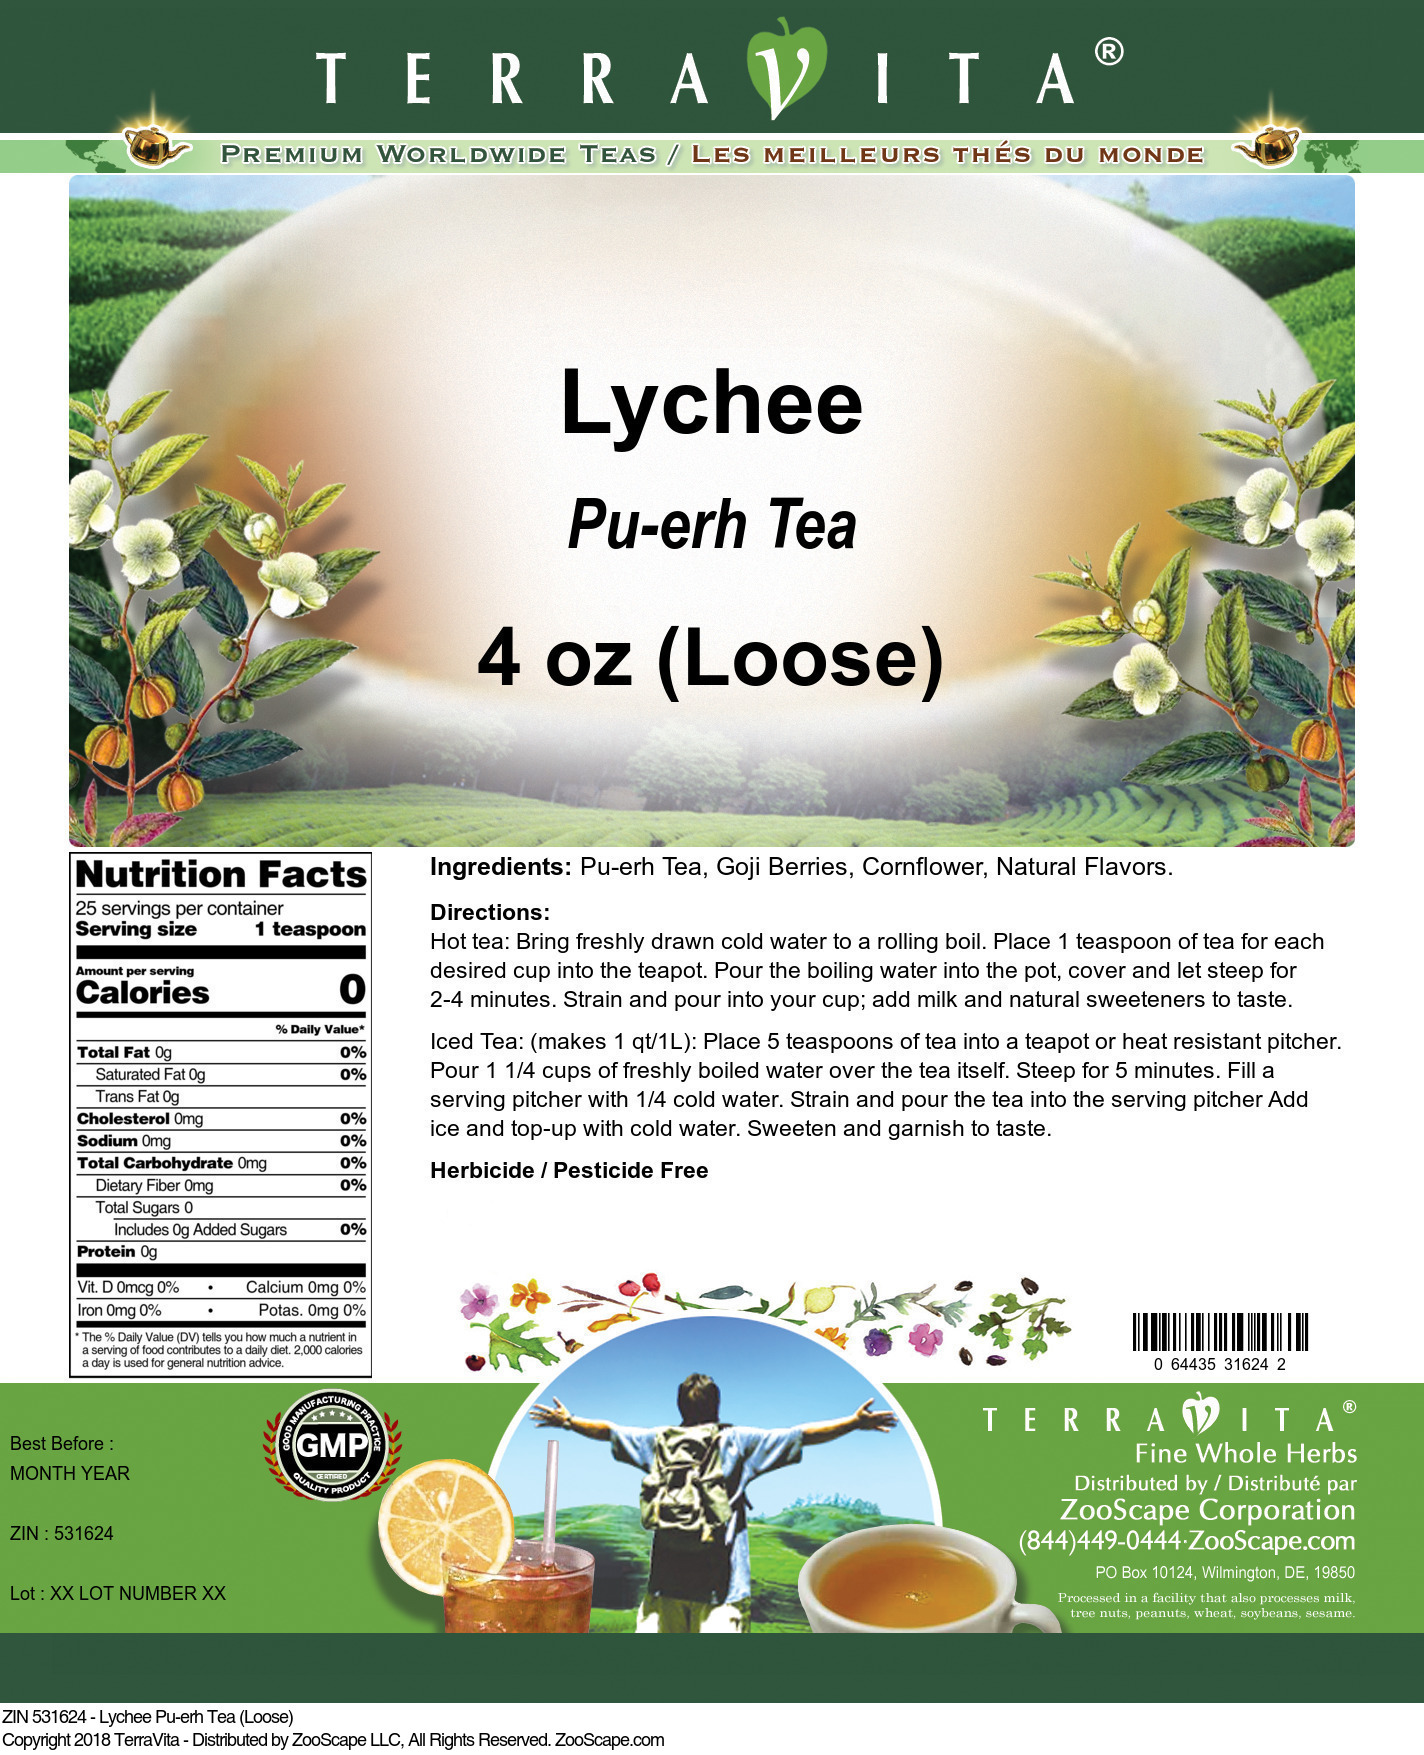 Lychee Pu-erh Tea (Loose)